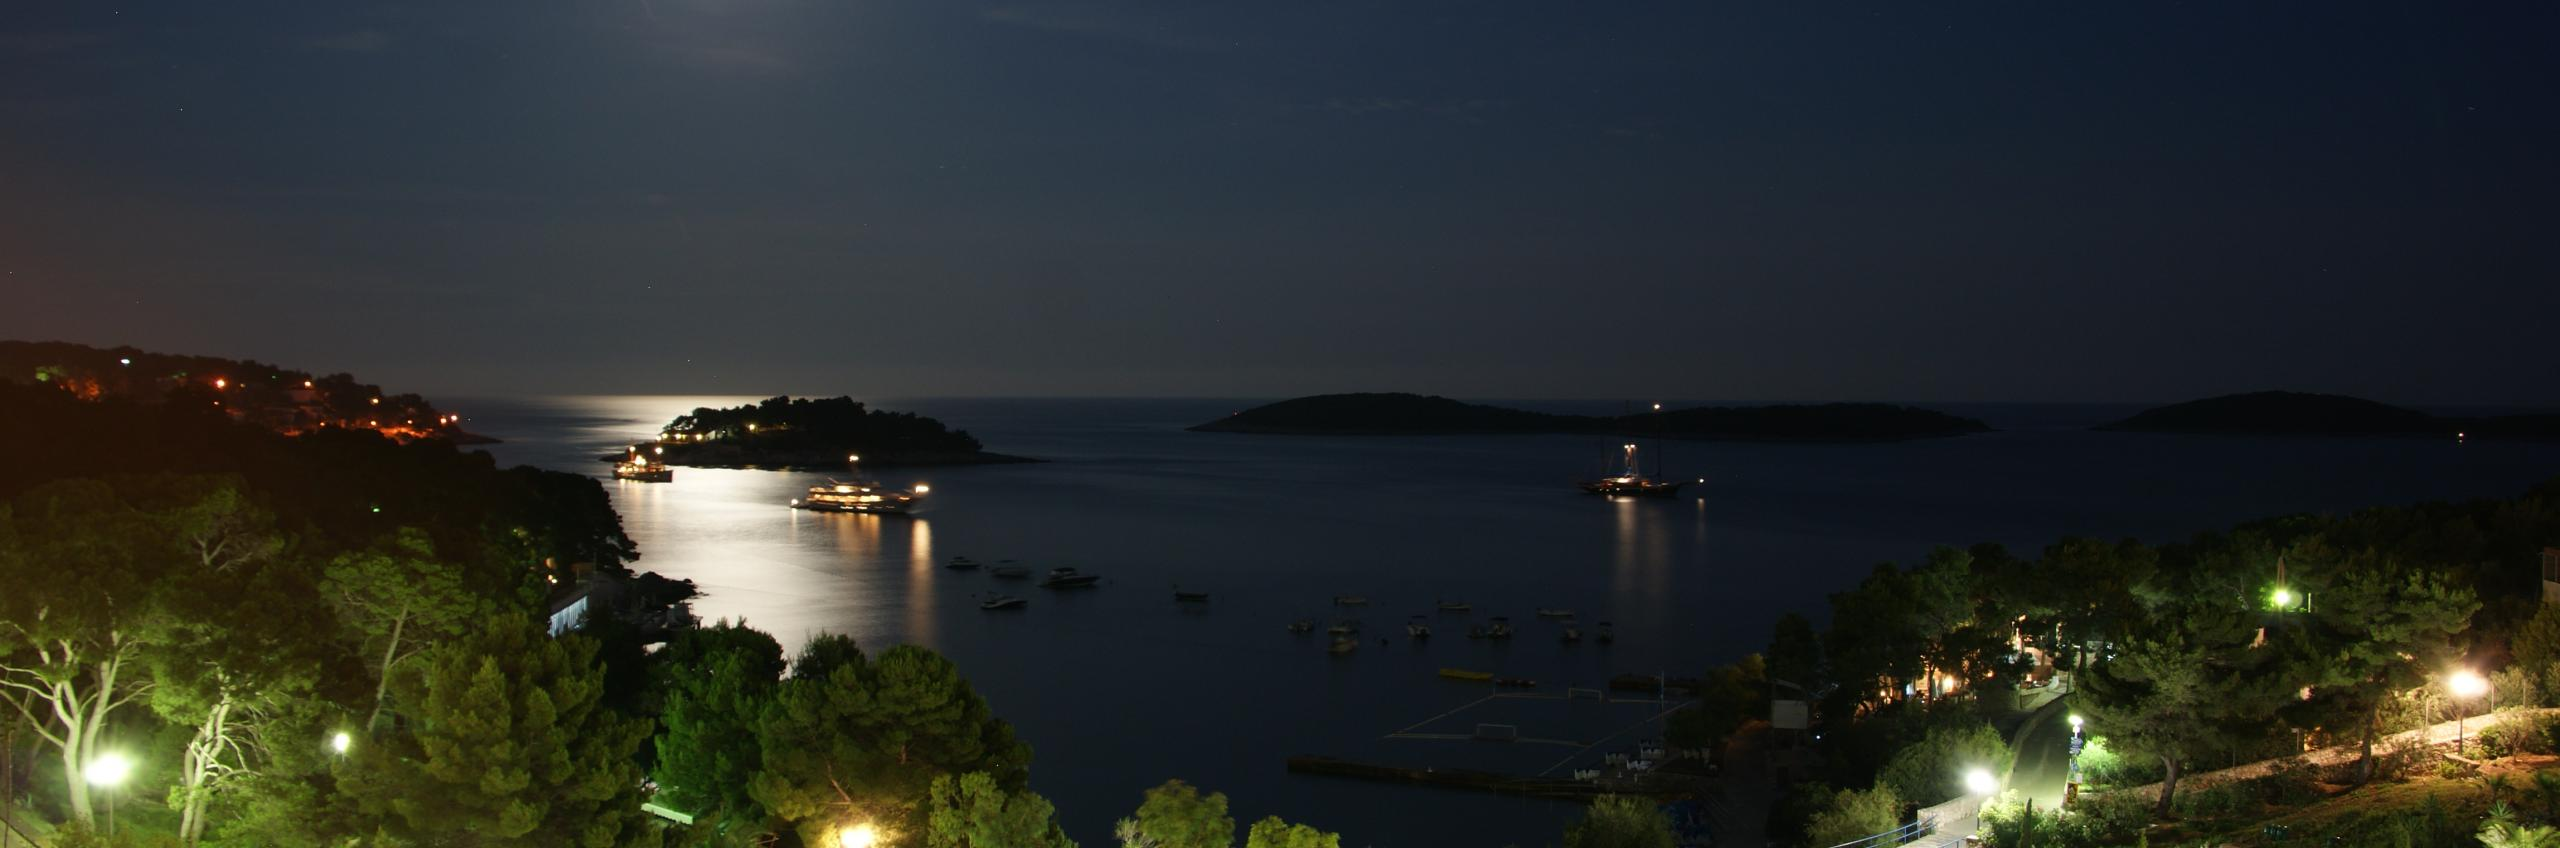 Croatia: Peaceful and safe haven